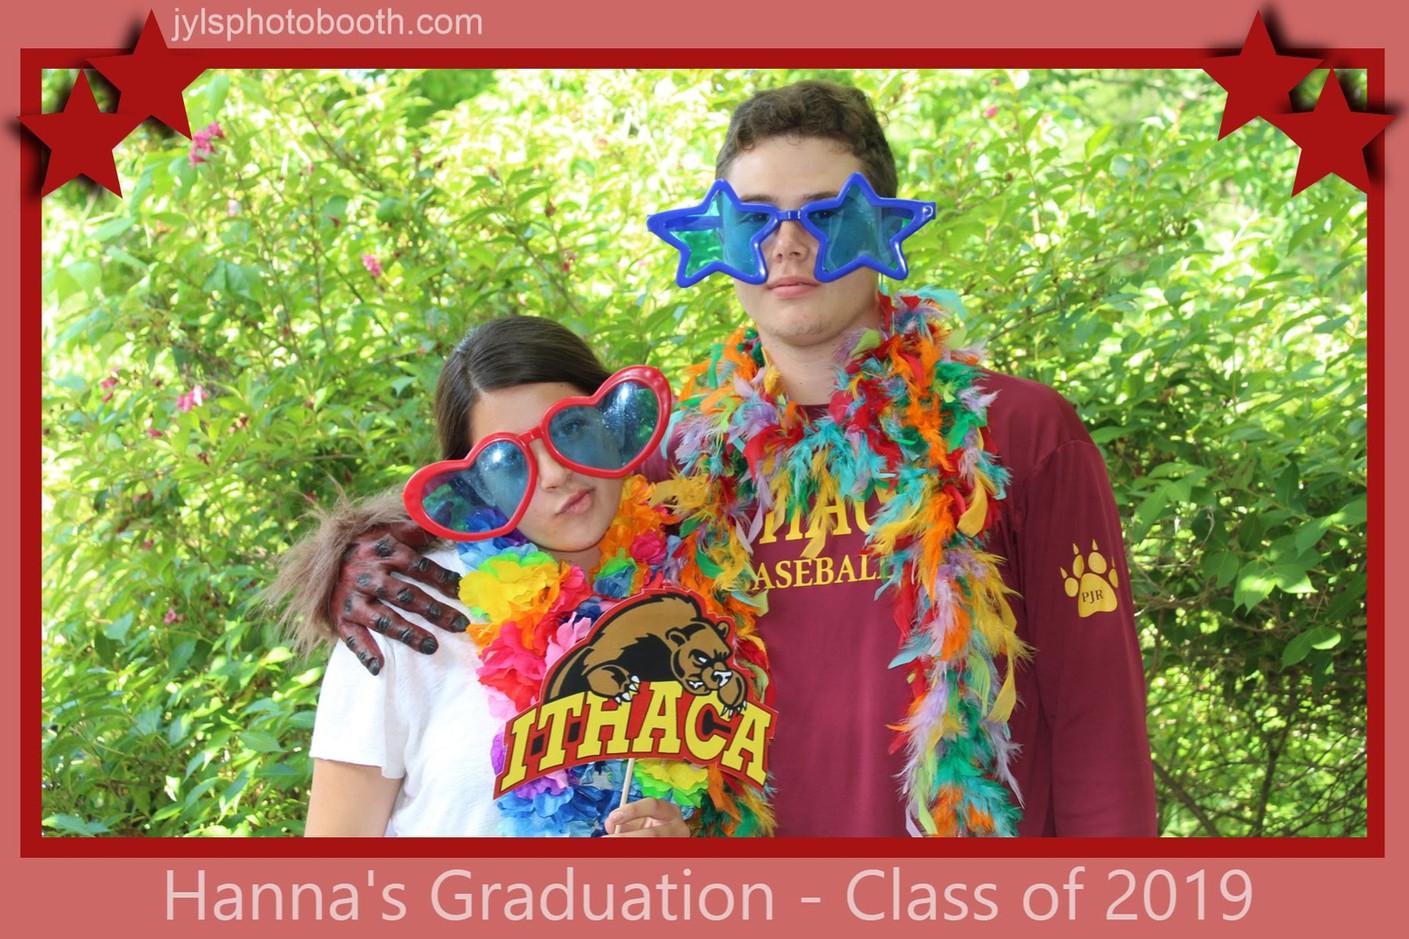 hannas-graduation_48166241677_o copy.jpg